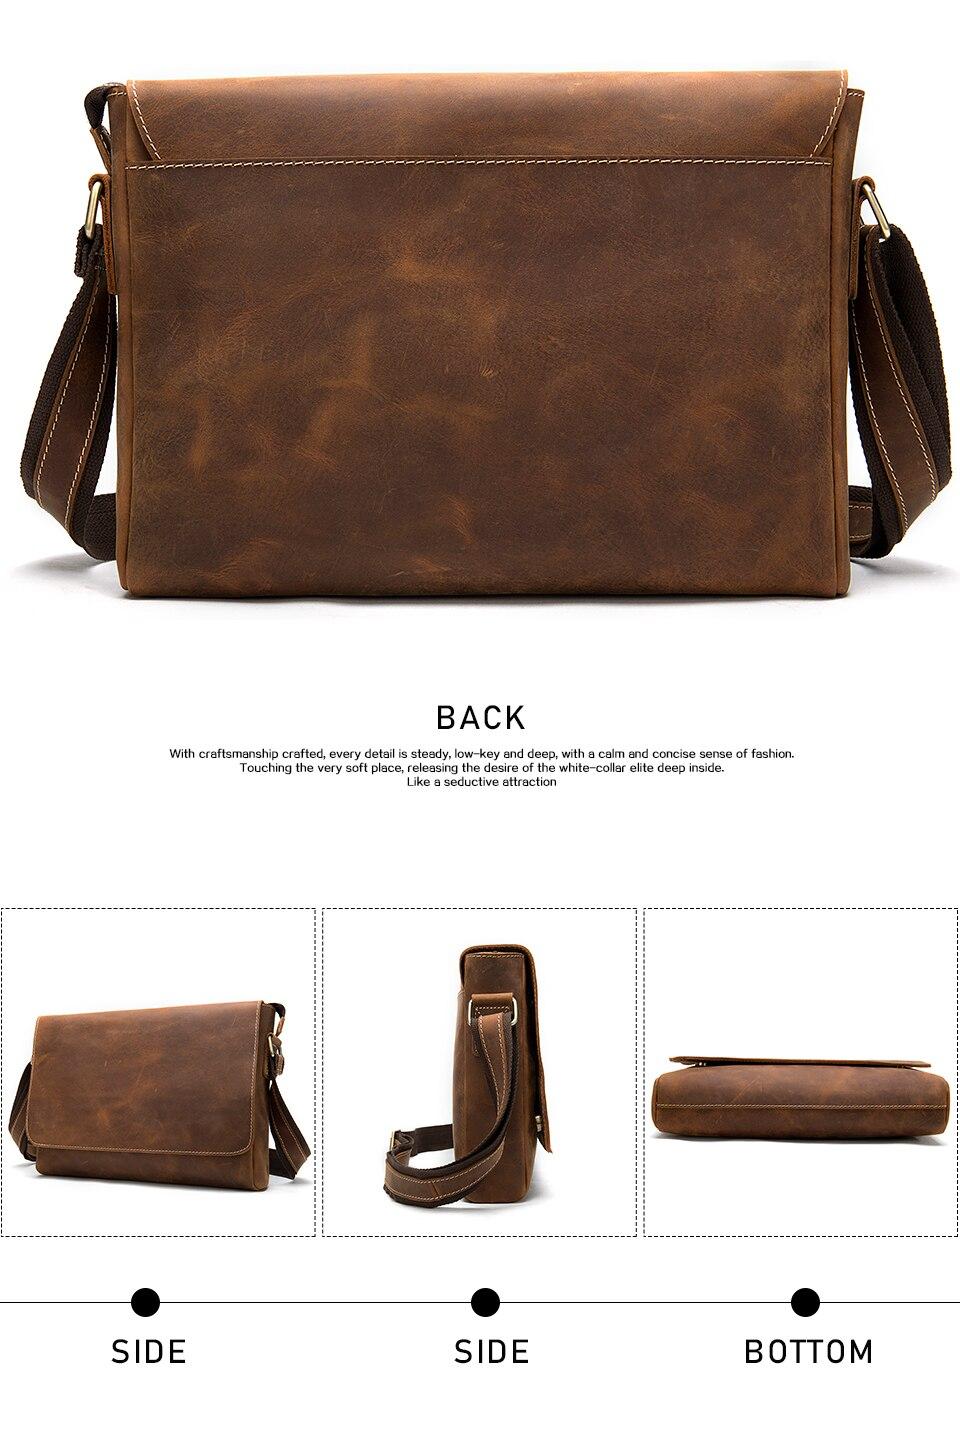 H7b11483cc9d948f8ad5527dc57f913933 WESTAL Men's Briefcases Laptop Bag Leather Lawyer/office Bags Messenger Bags Men's Crazy Horse Leather Briefcases Business Bag